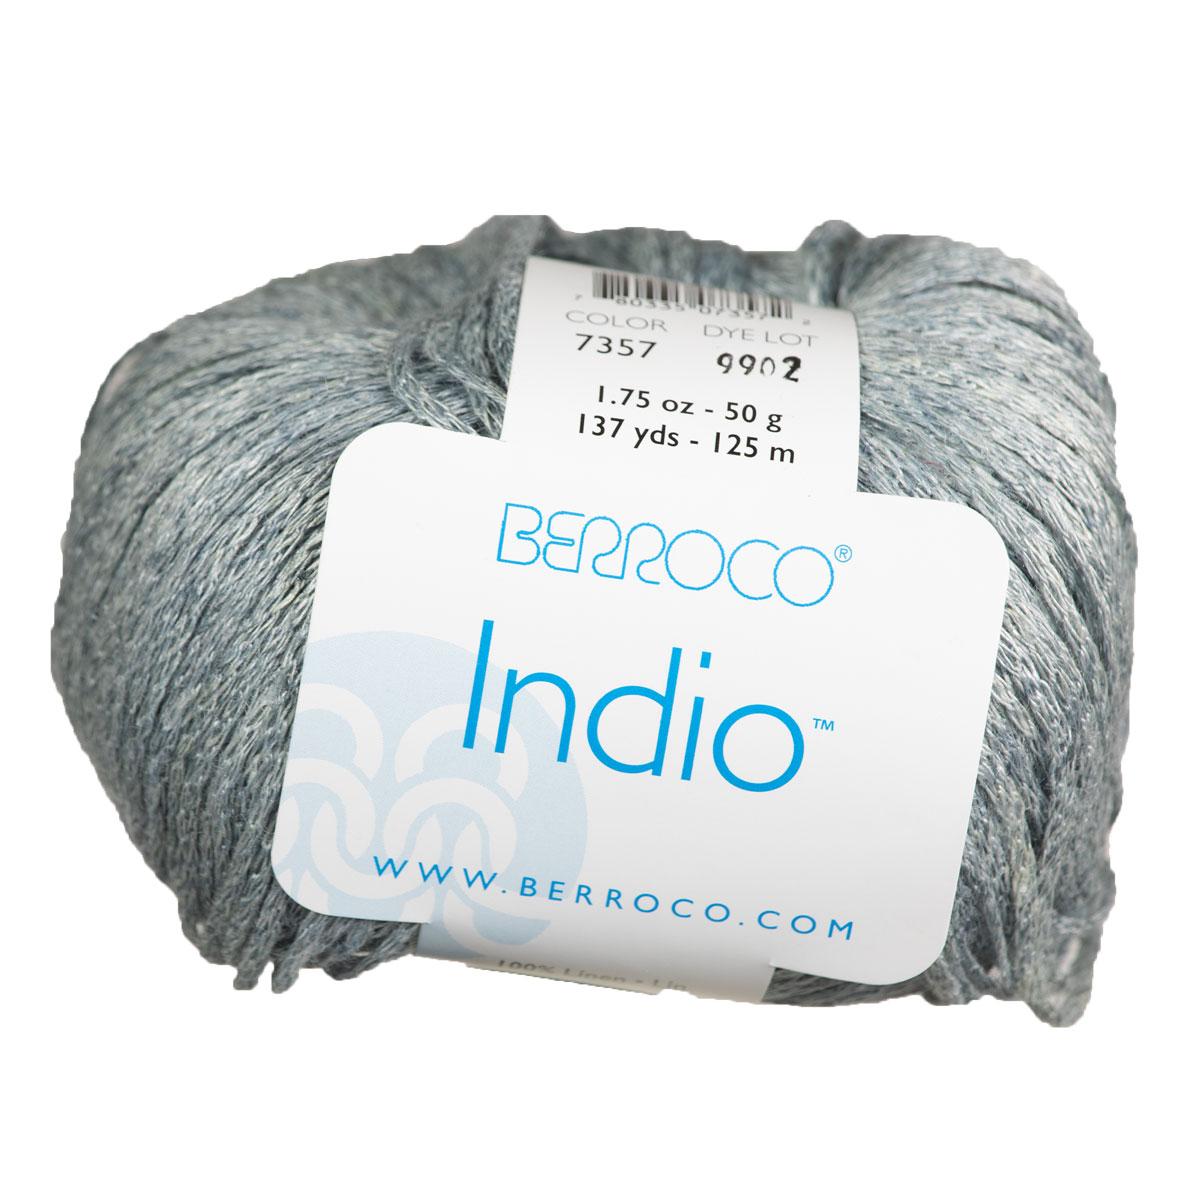 Berroco Linen Stonewash (Indio) Yarn - 7357 Acadia